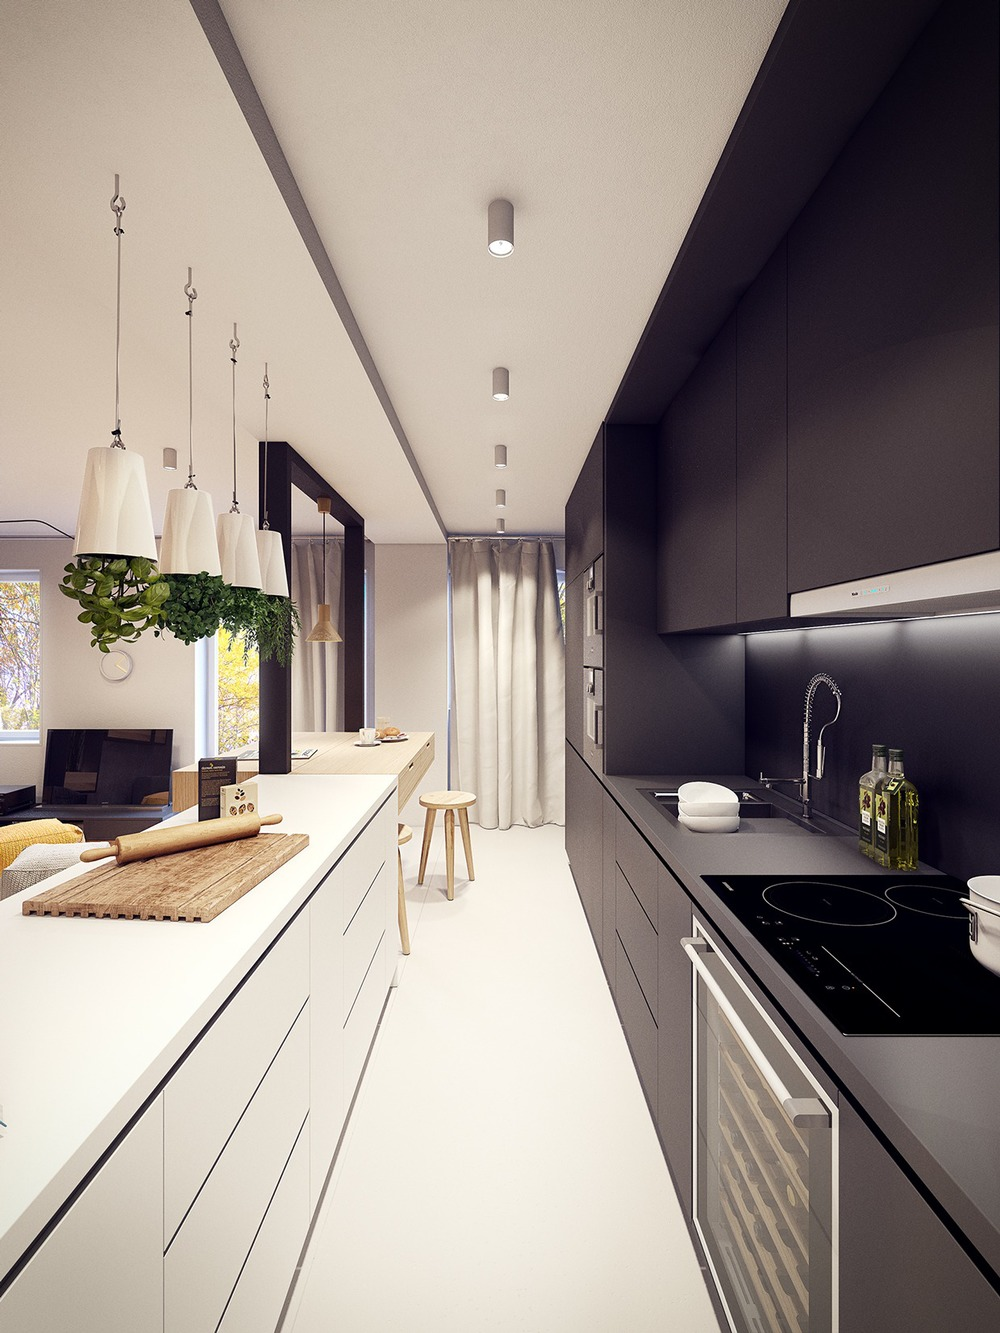 creative-sleek-kitchen.jpg